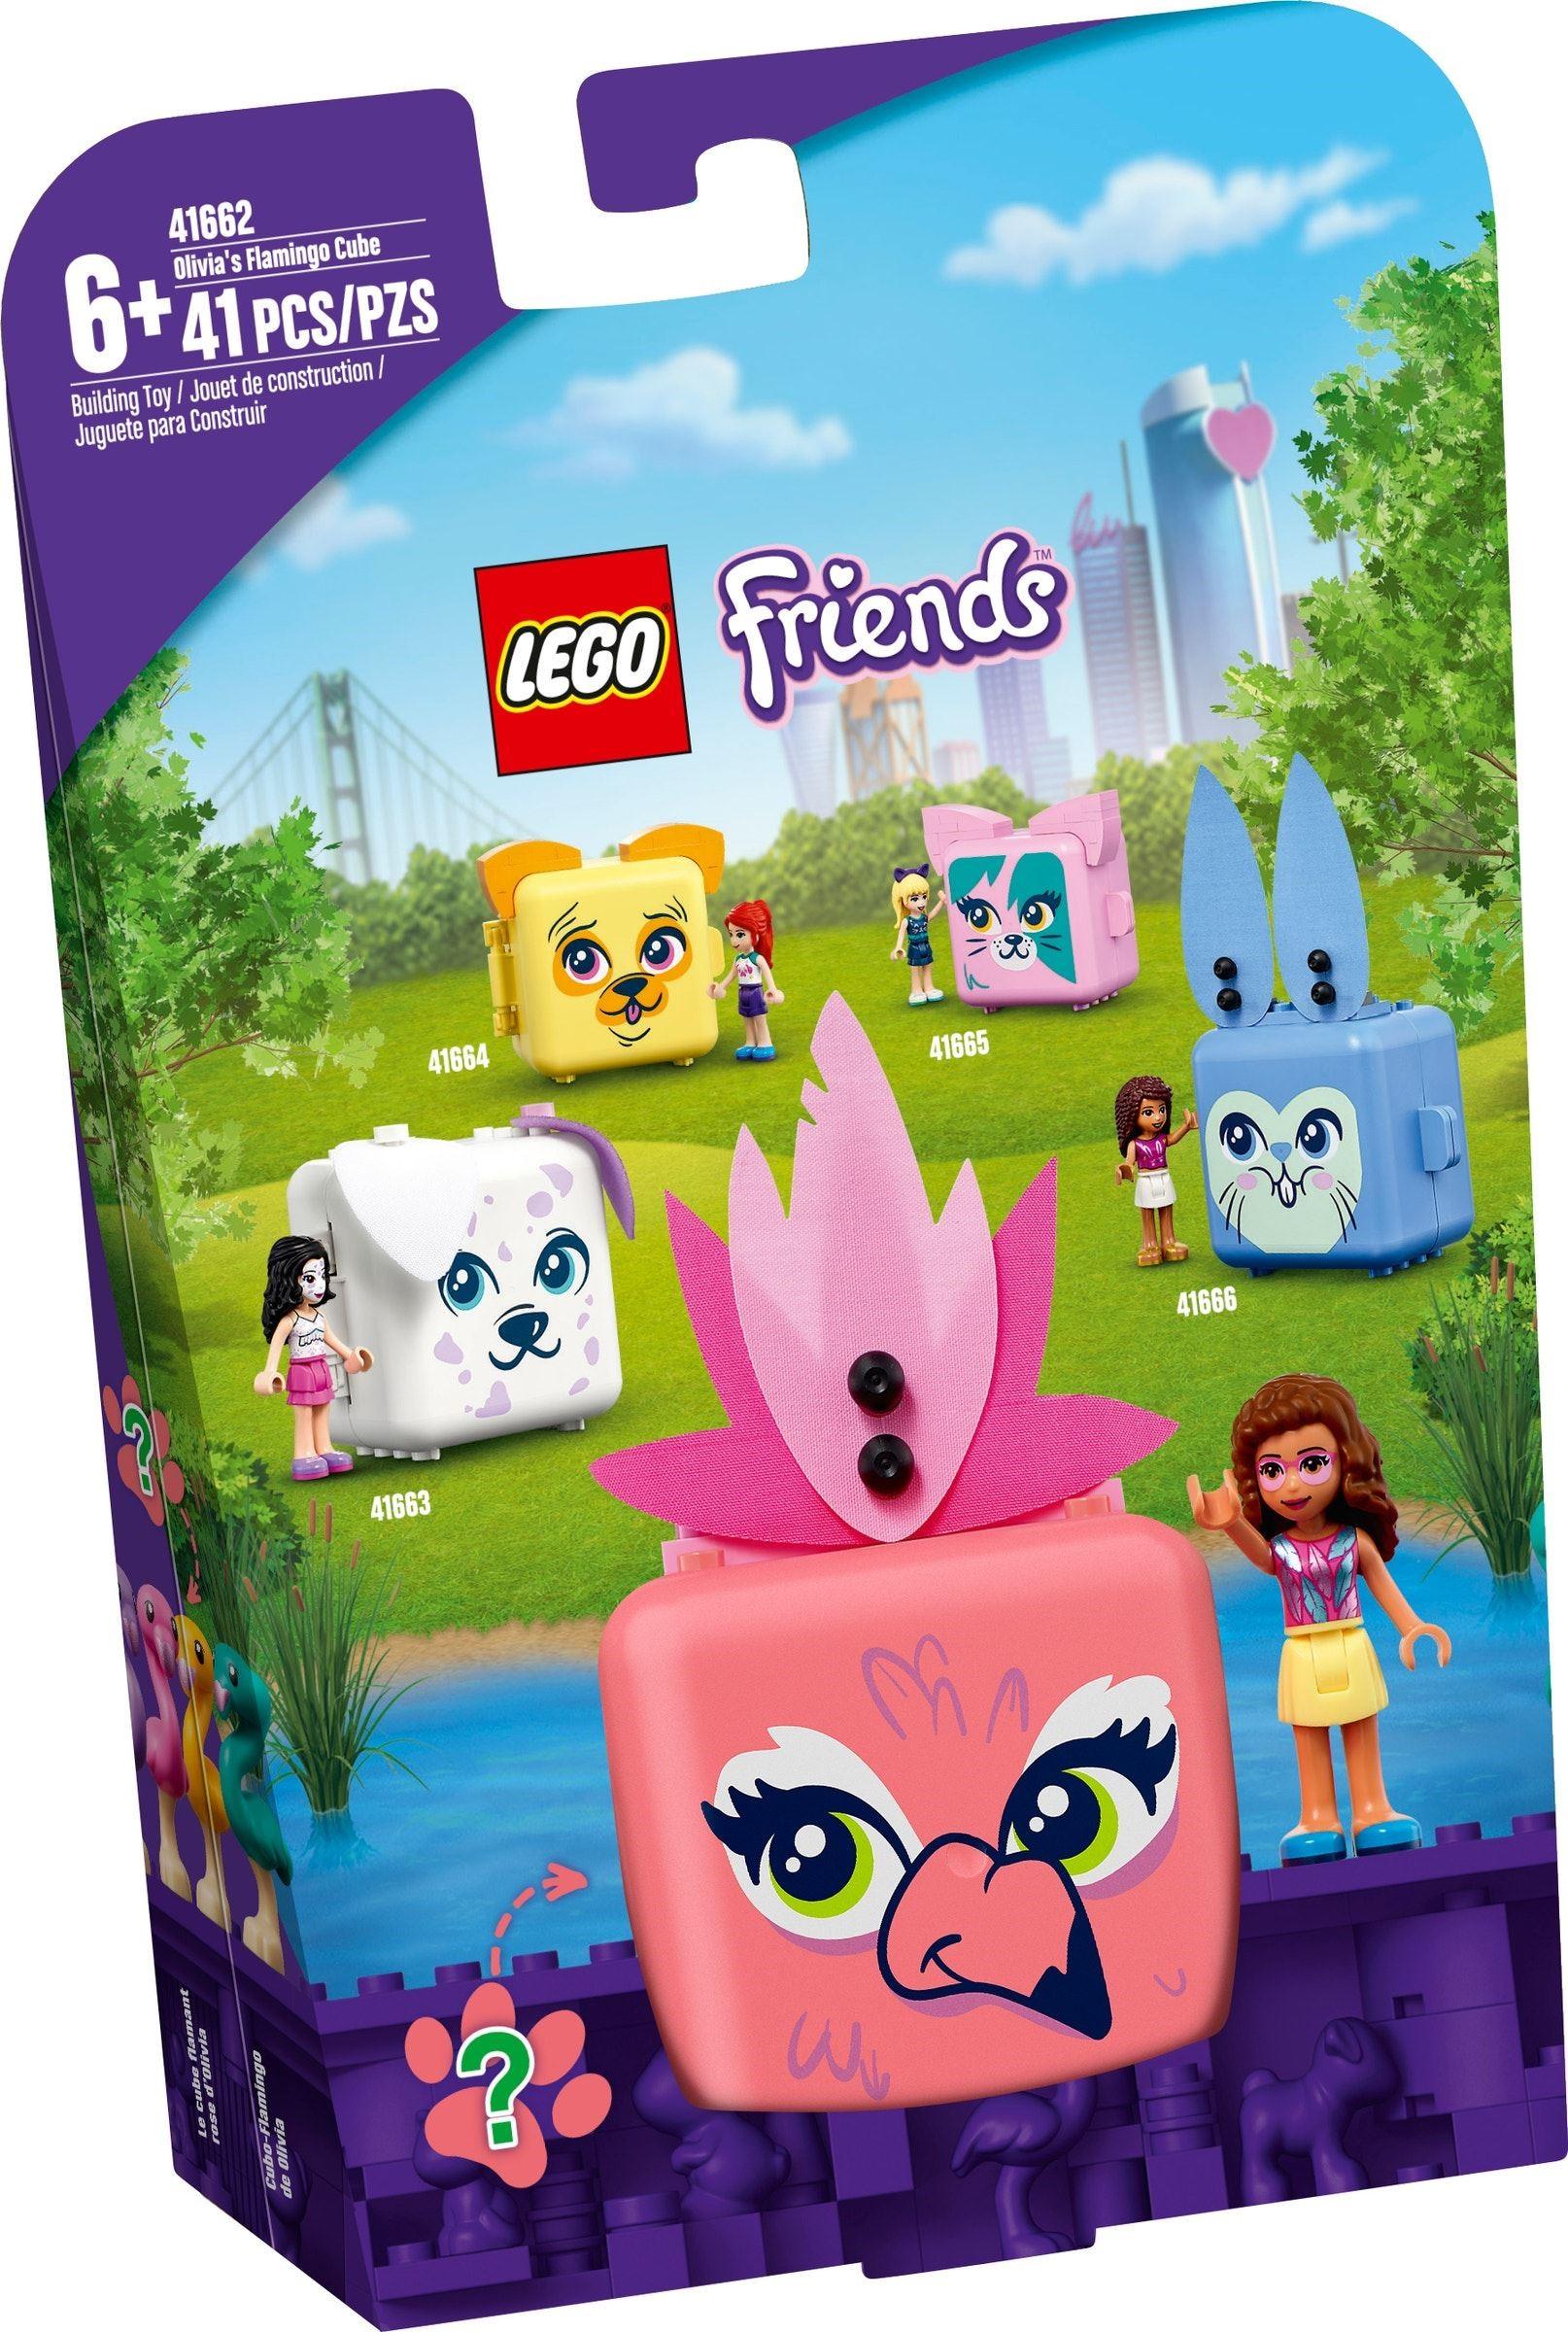 LEGO Friends - Olivia's Flamingo Cube (41662)